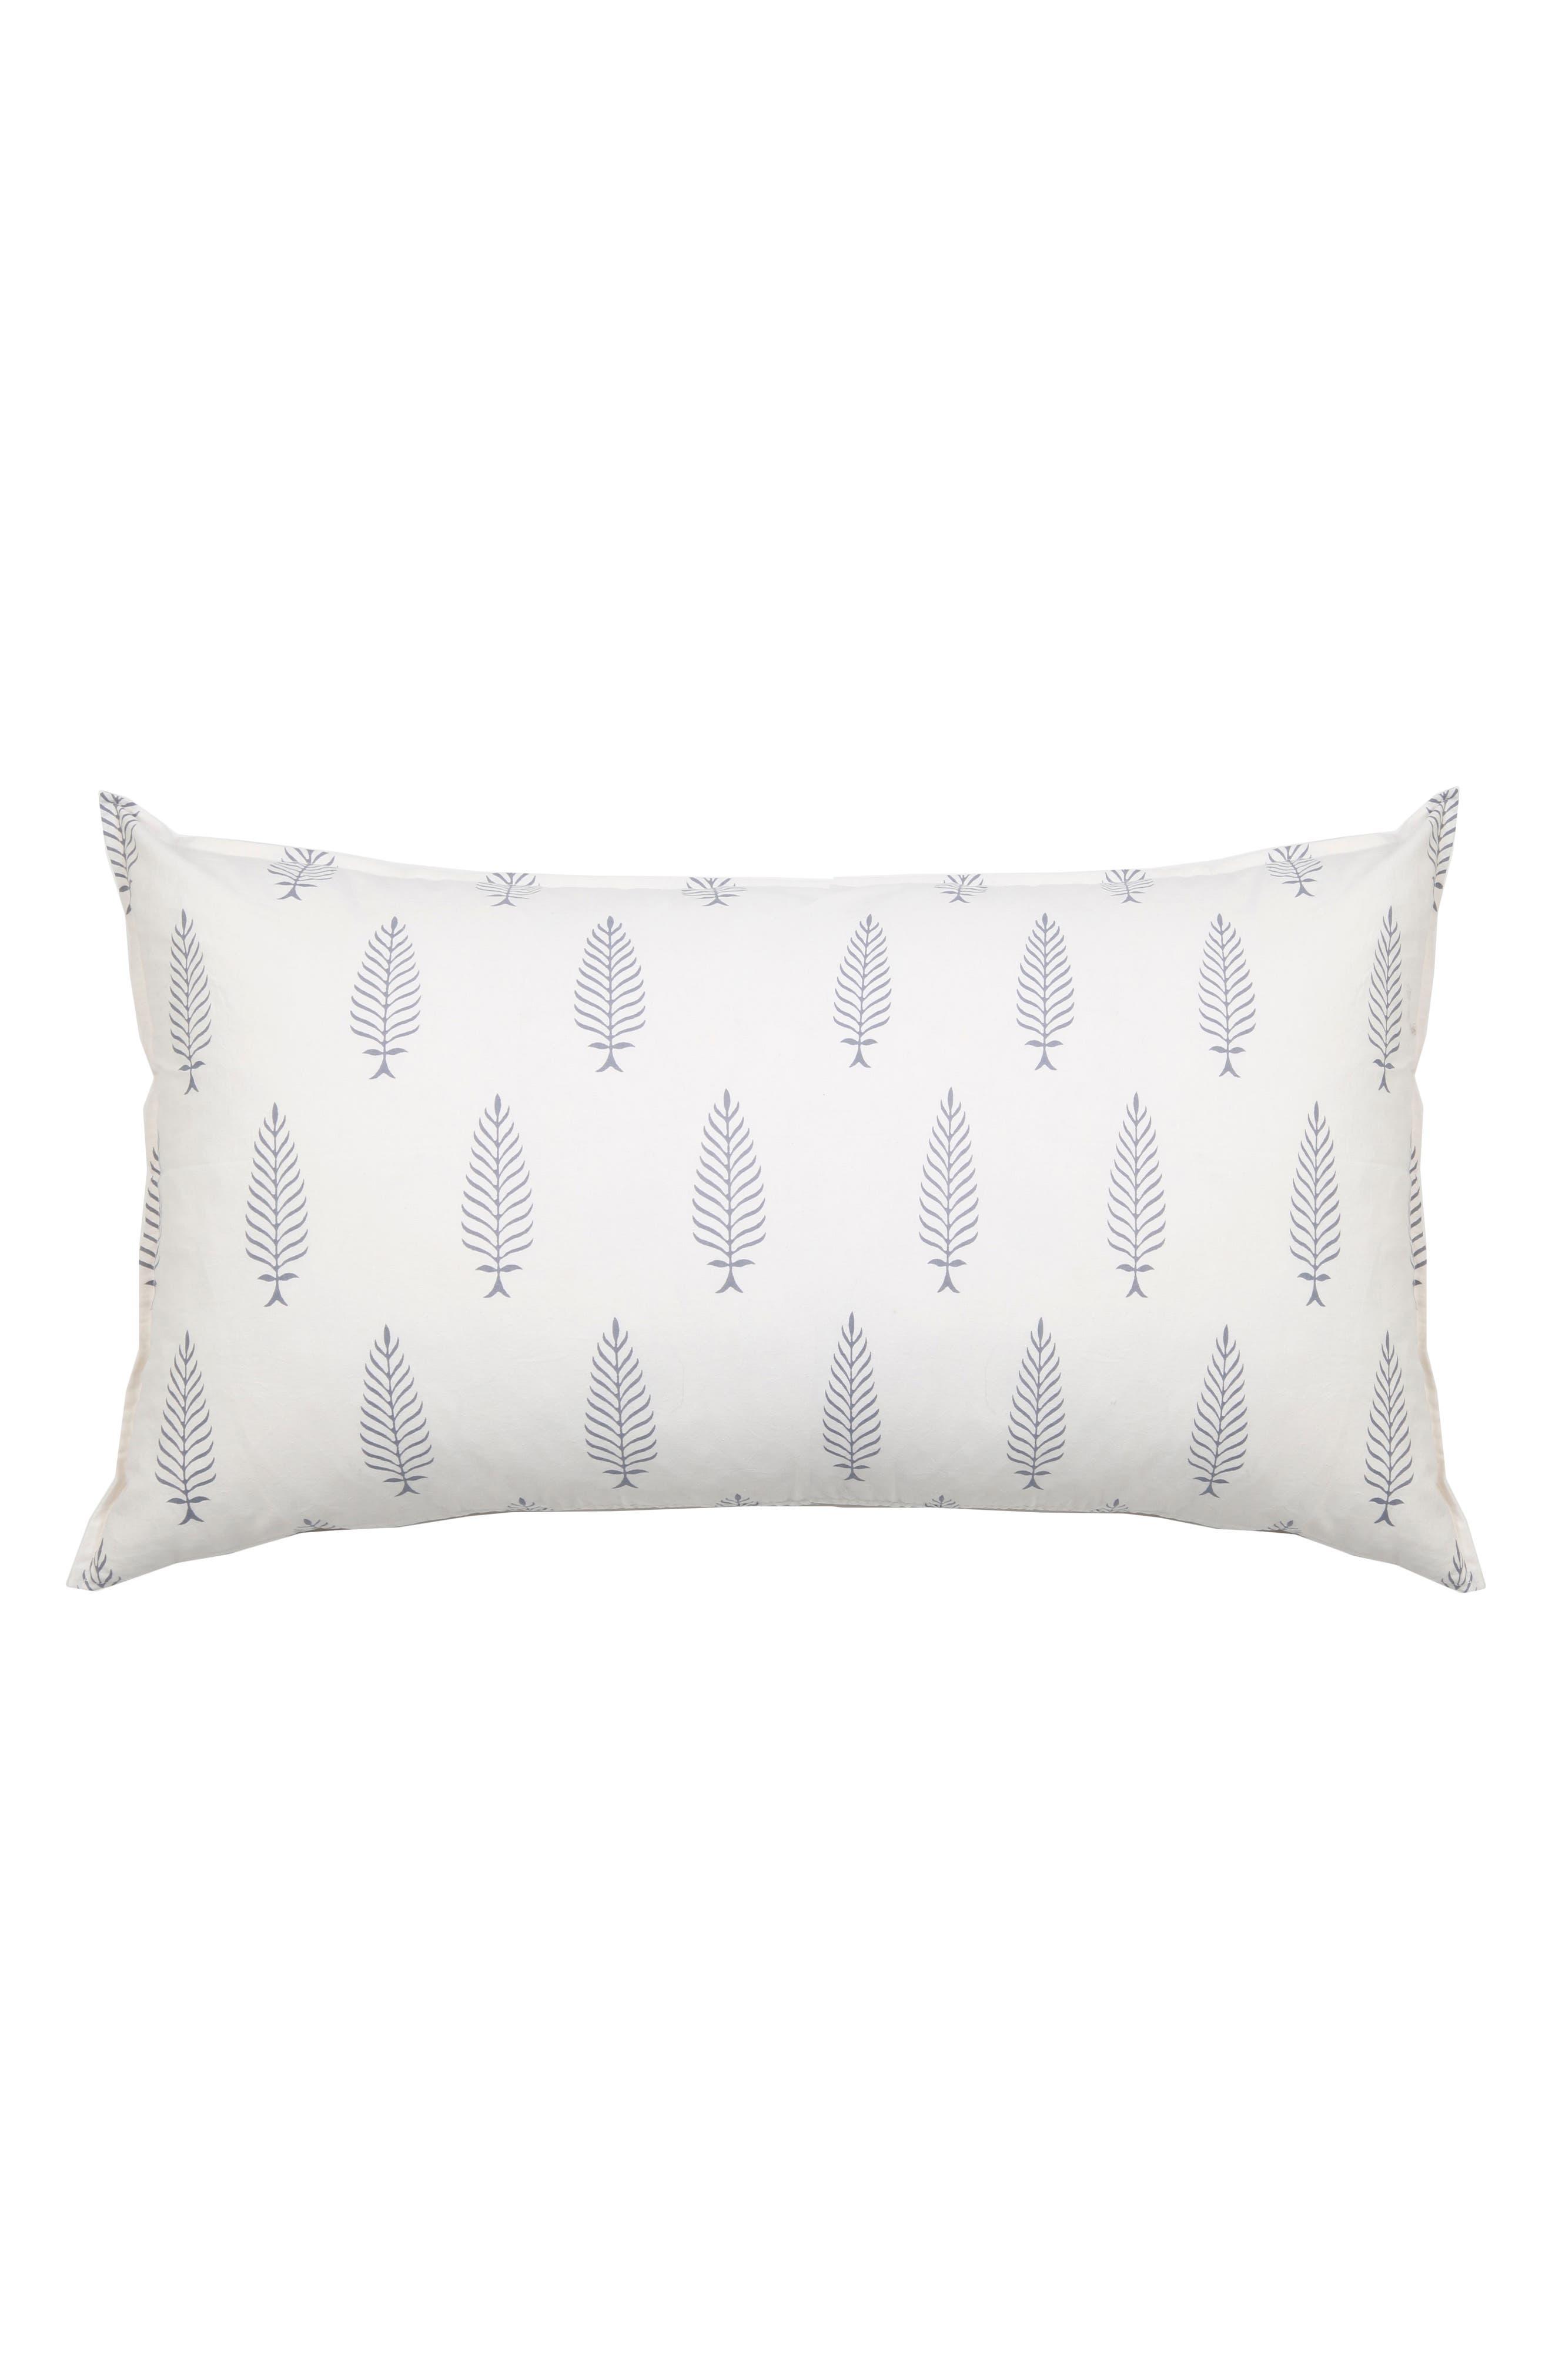 Kiara Accent Pillow,                         Main,                         color, Blue Multi